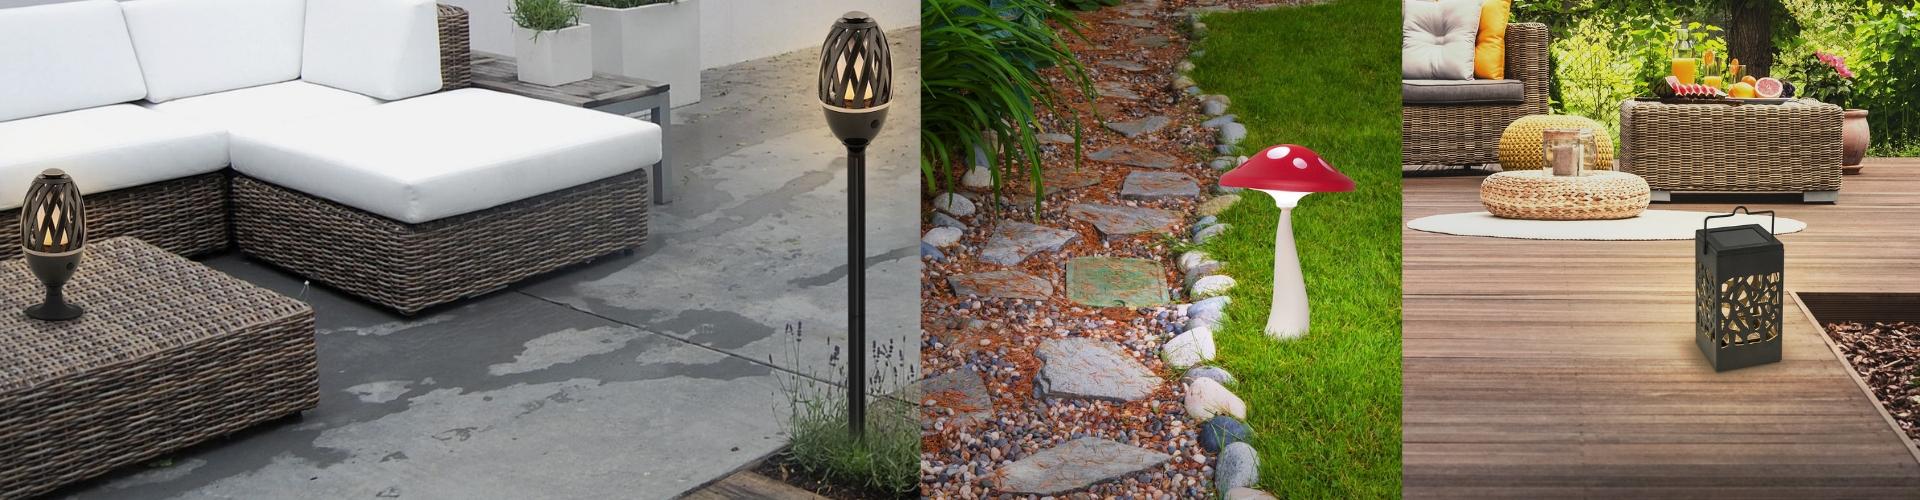 Външни декоративни лампи